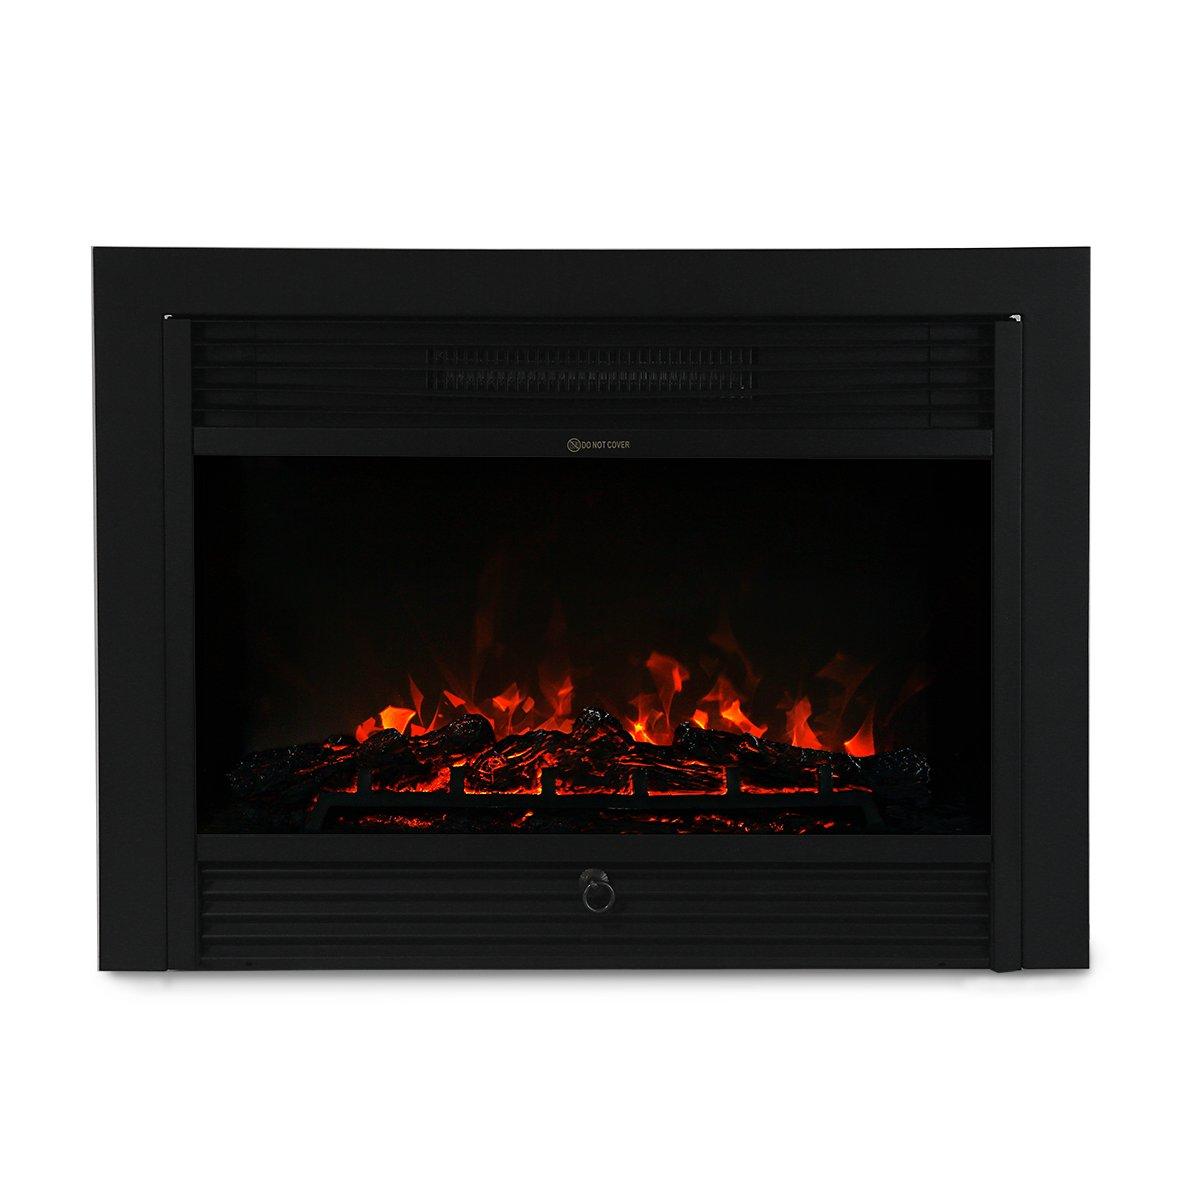 XtremepowerUS 28.5'' 1500W 5200BTU Embedded Electric Fireplace Insert Heater W/Remote Control